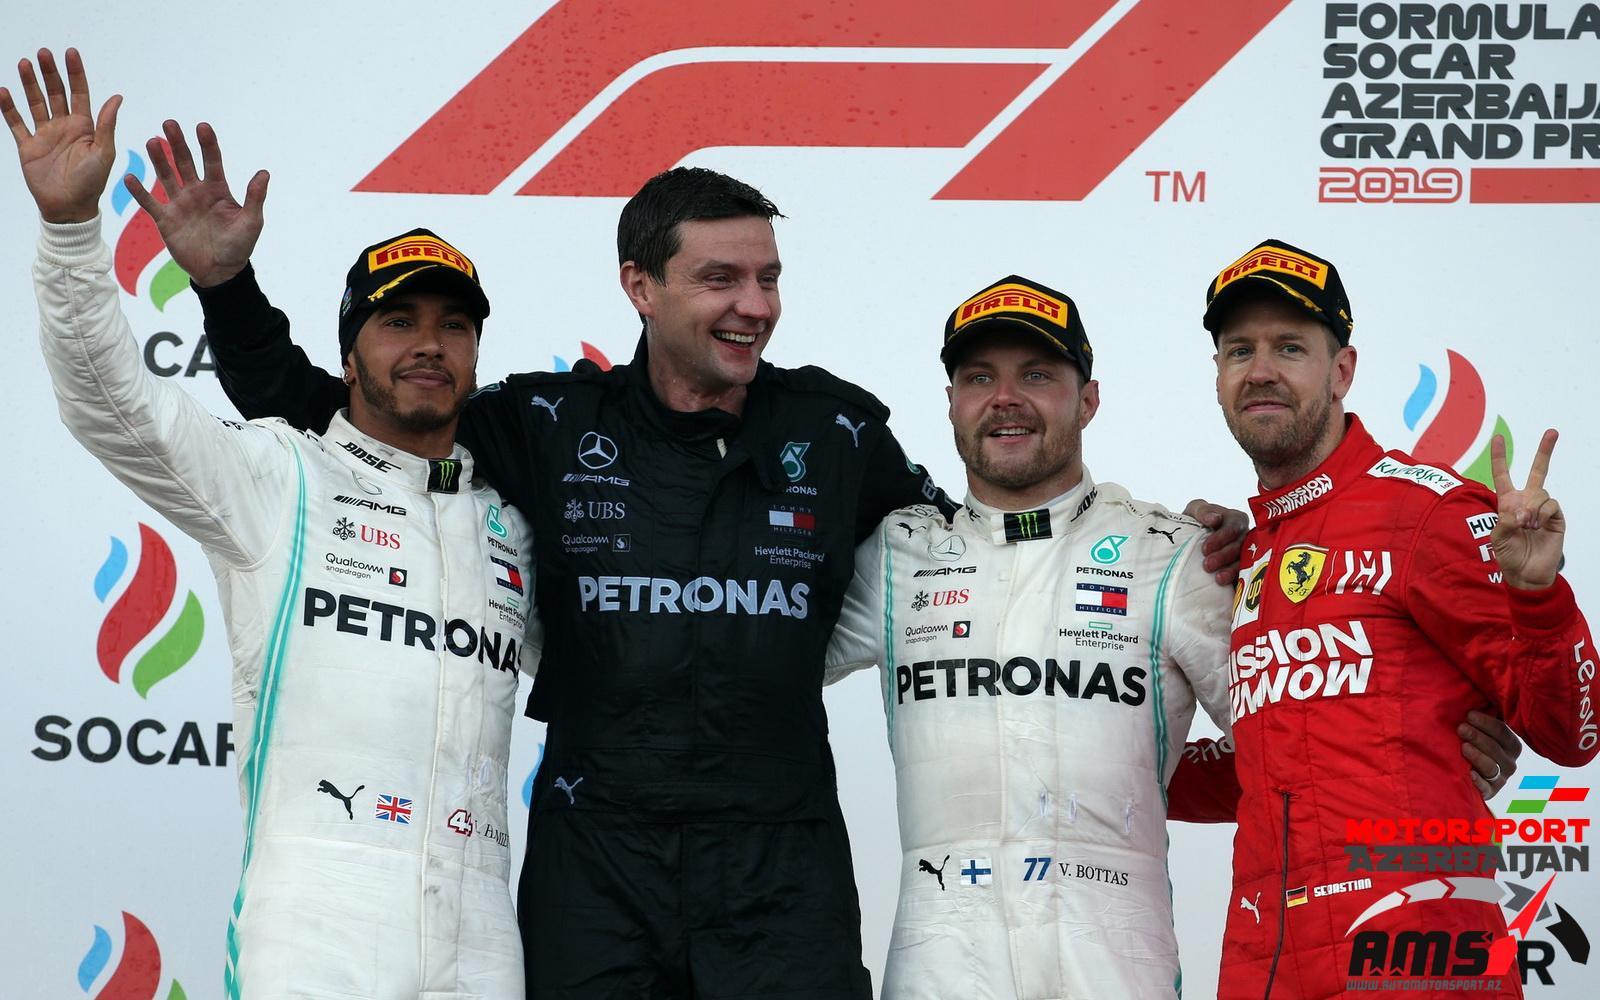 Lewis Hamilton, Valtteri Bottas, Sebastian Vettel